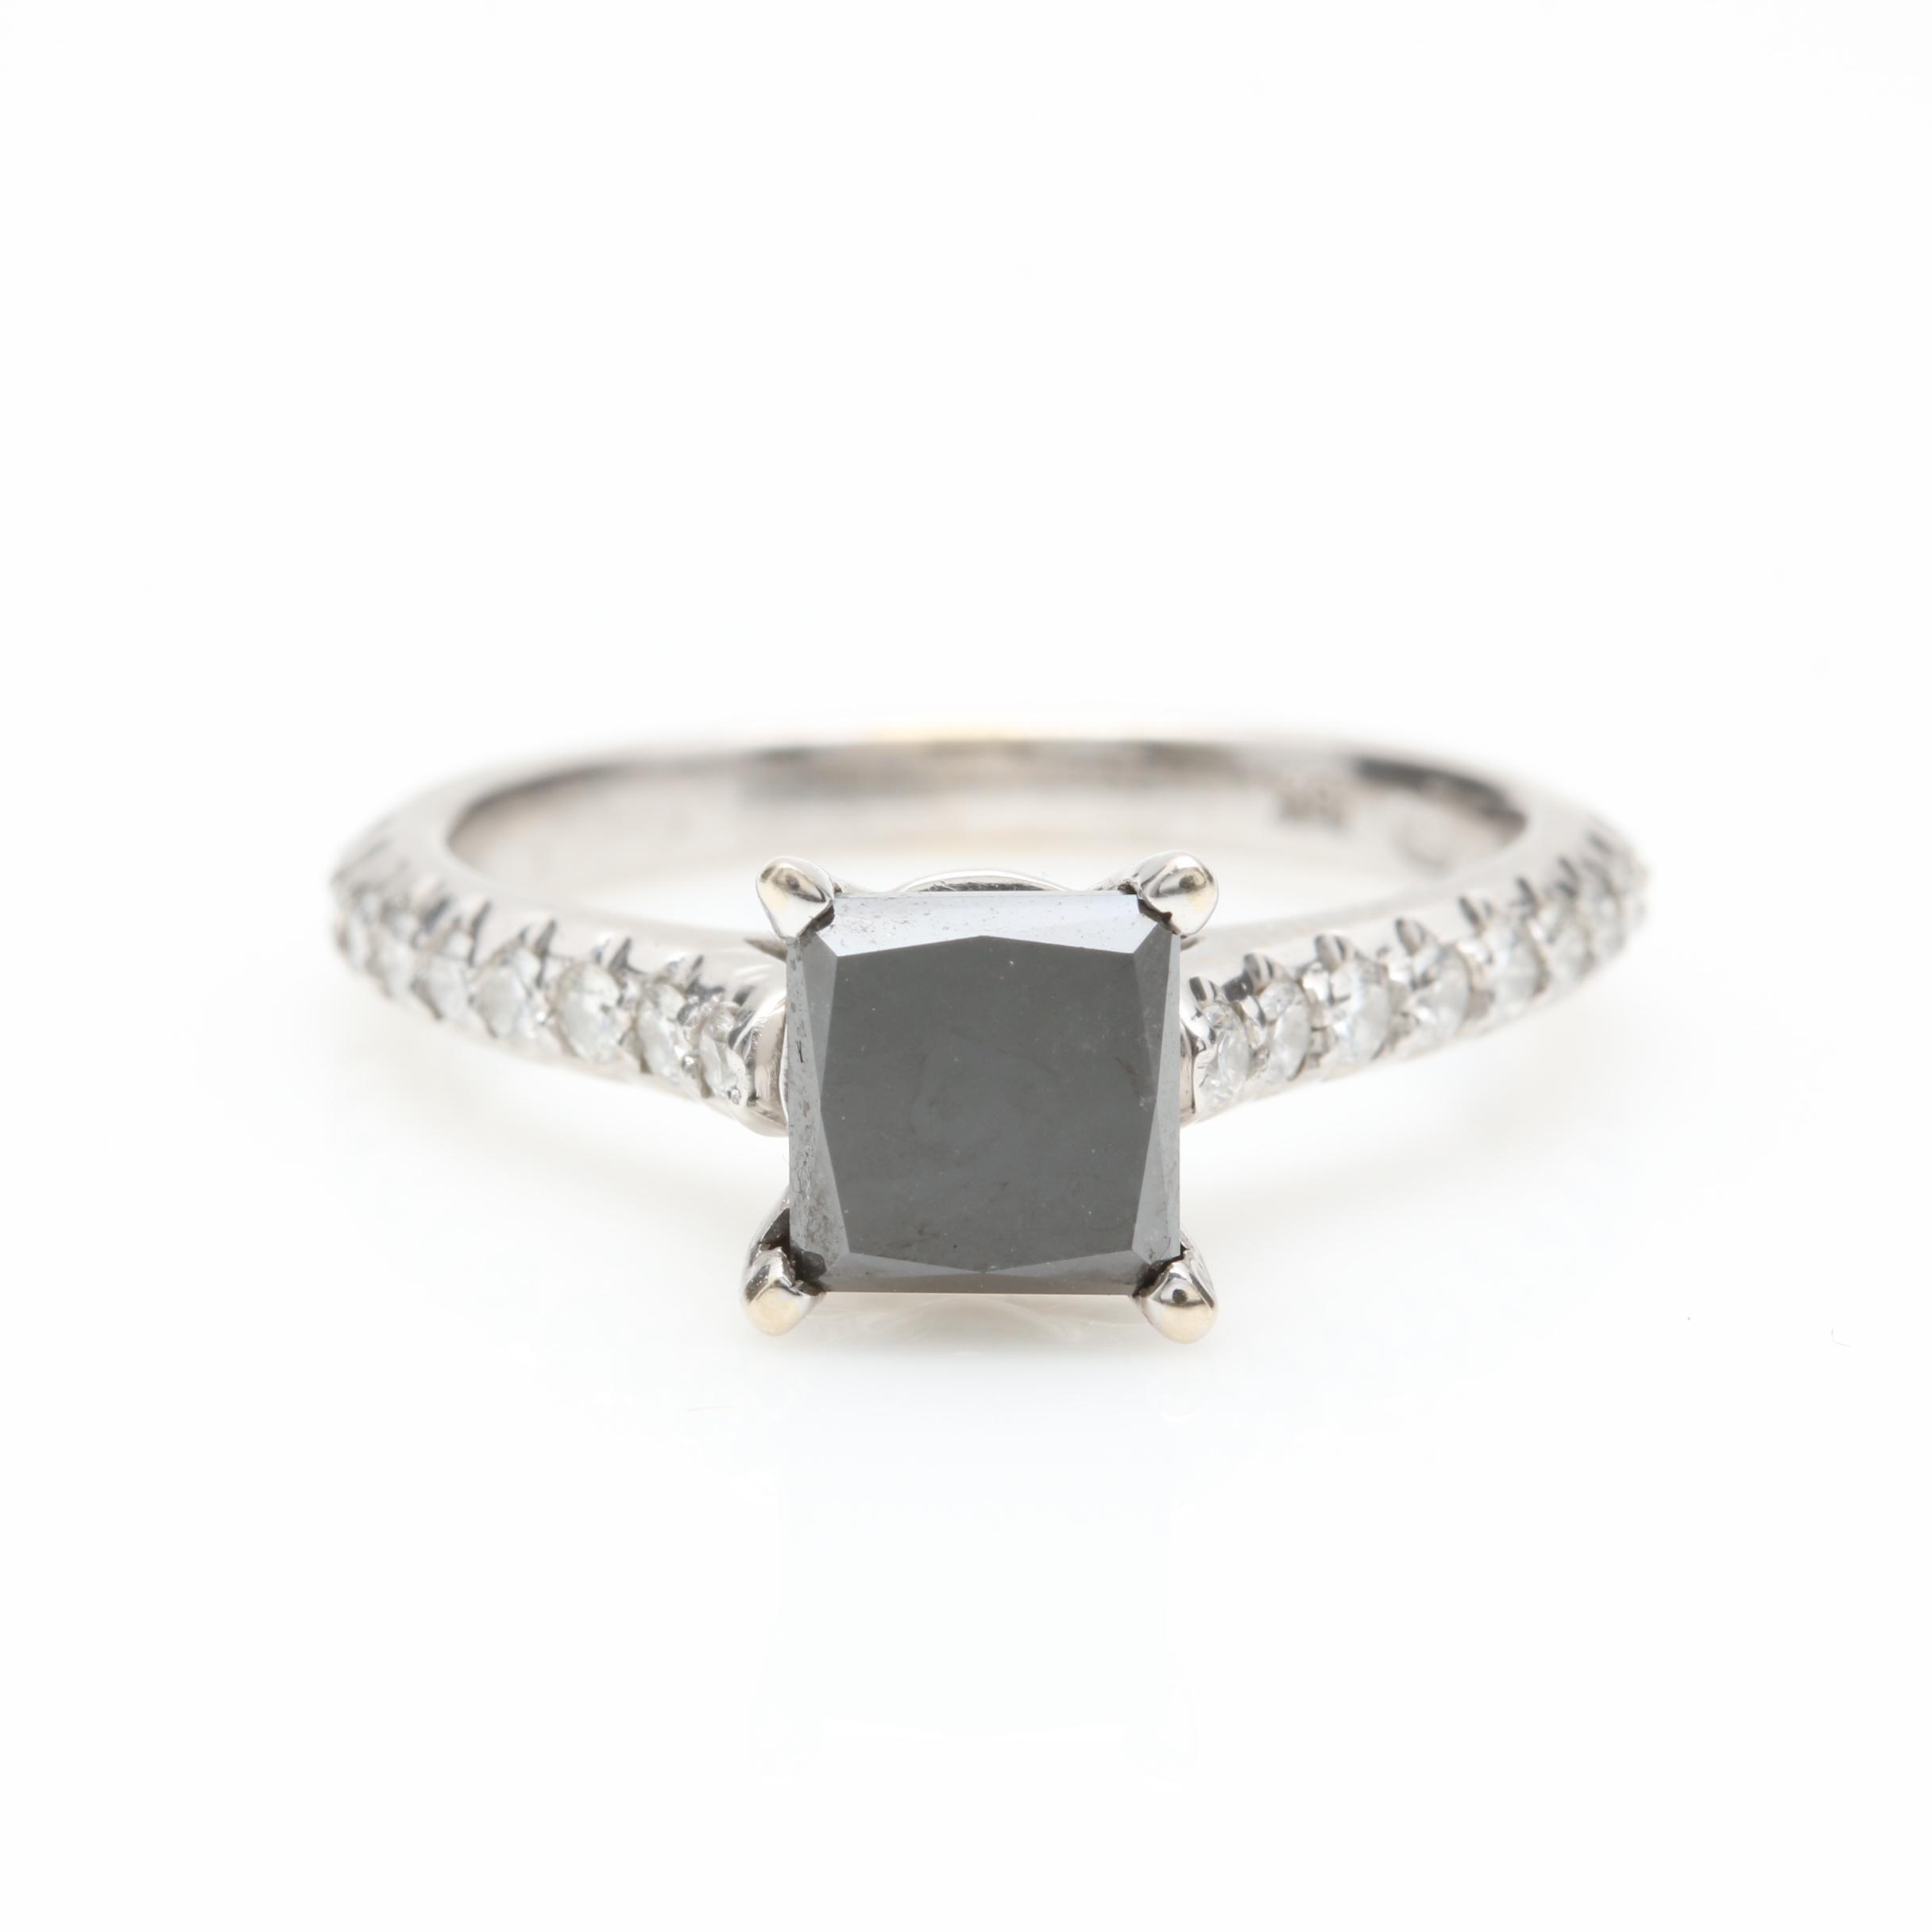 18K White Gold 1.63 CTW Diamond Ring